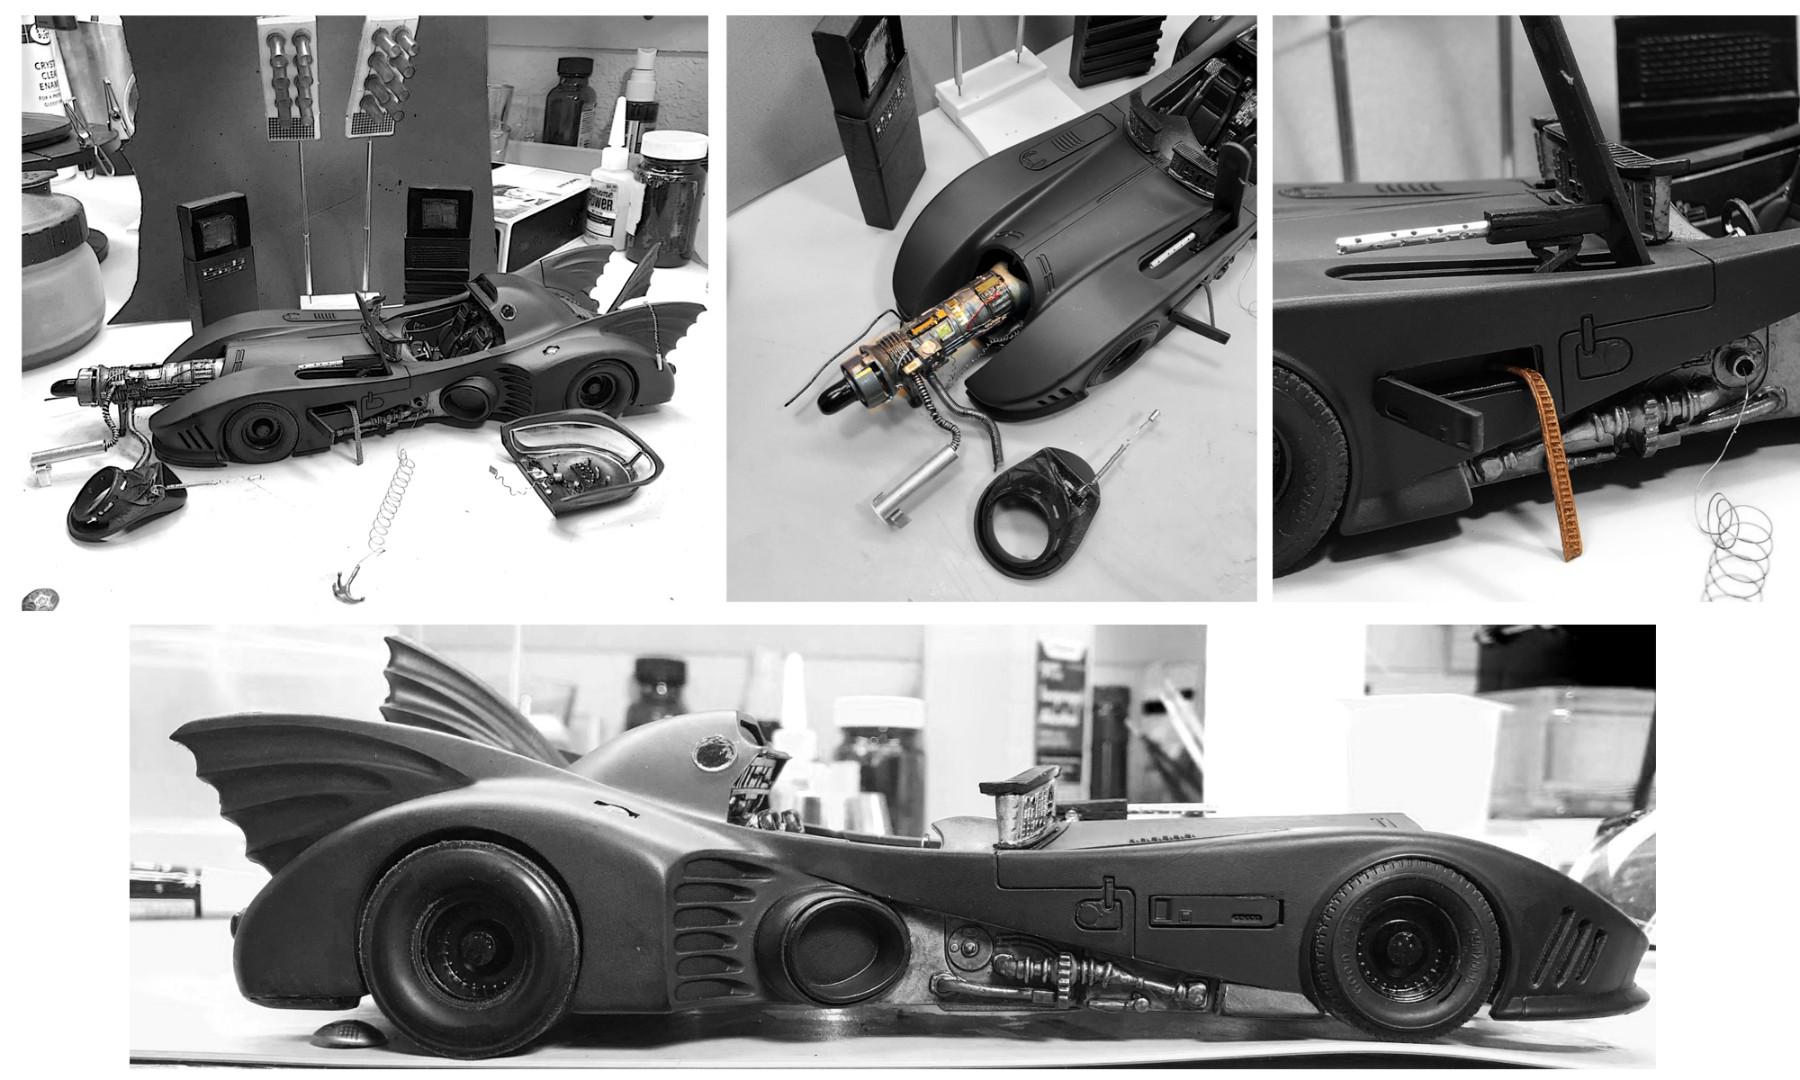 batmobile details VIII  08  03  2019.jpg